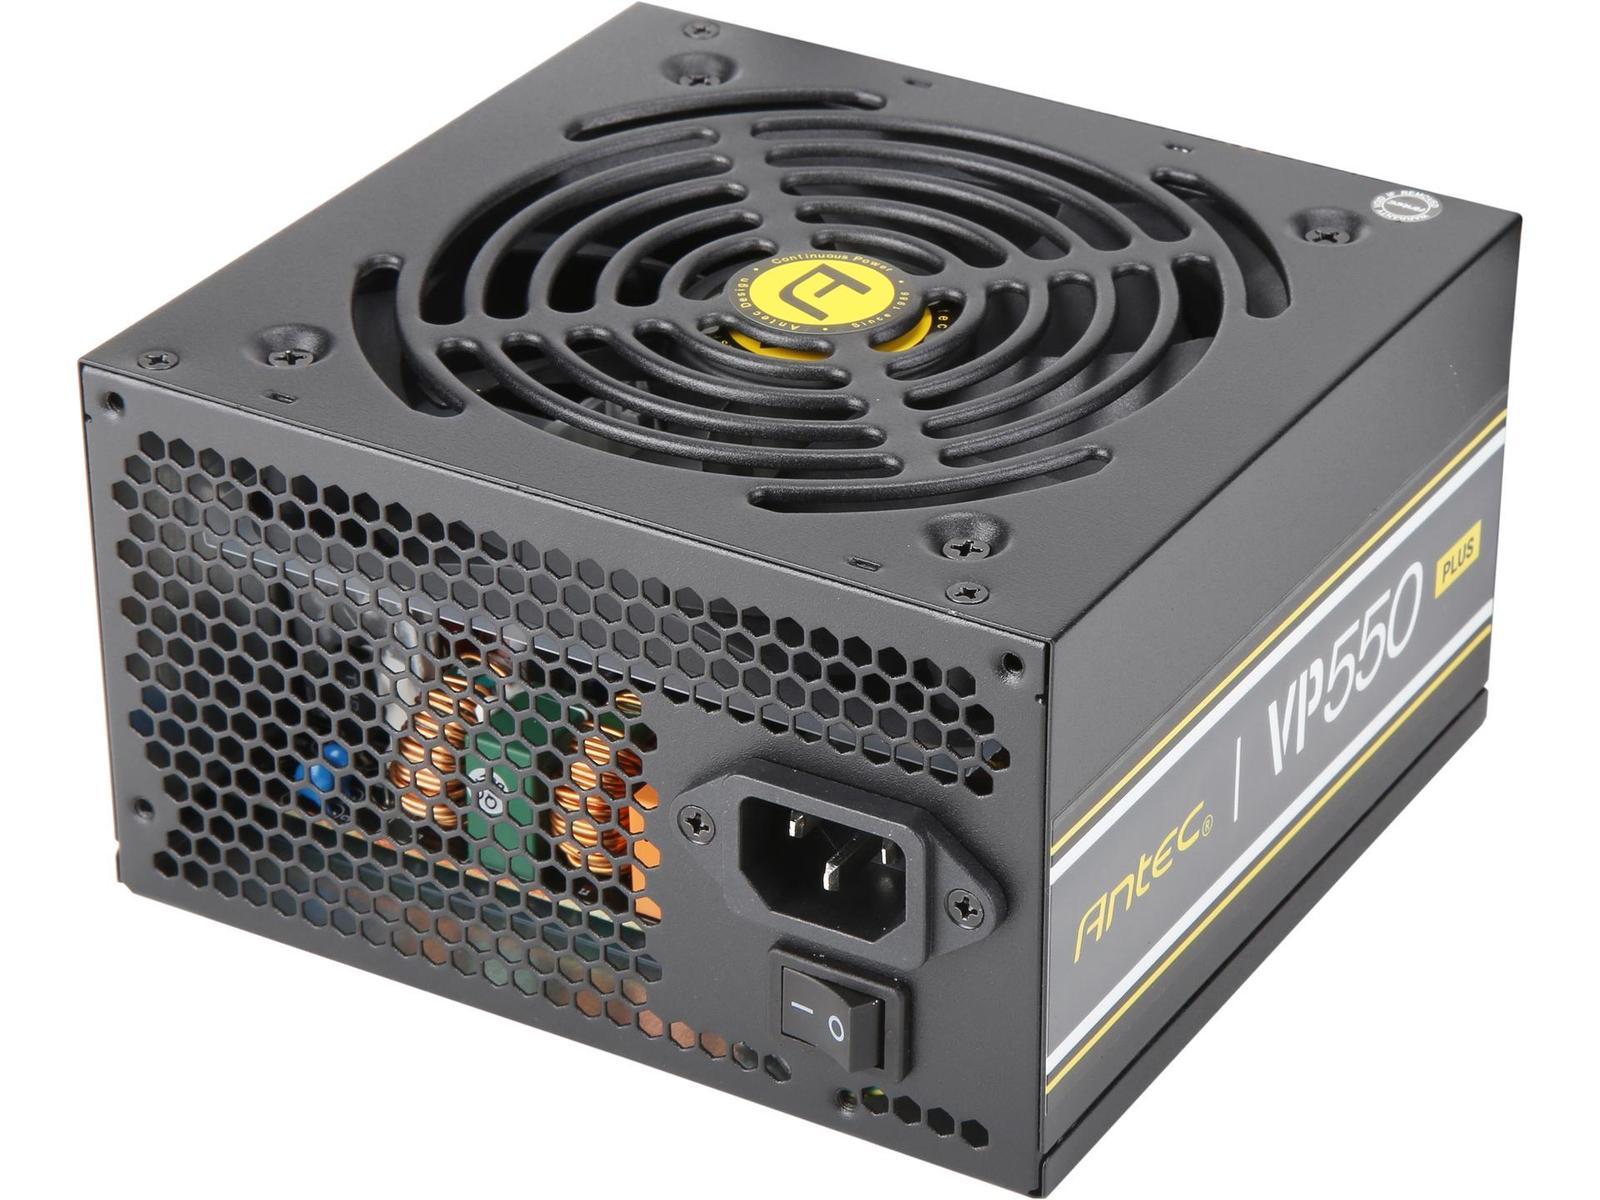 Antec VP PLUS 550 W 80+ Certified ATX Power Supply